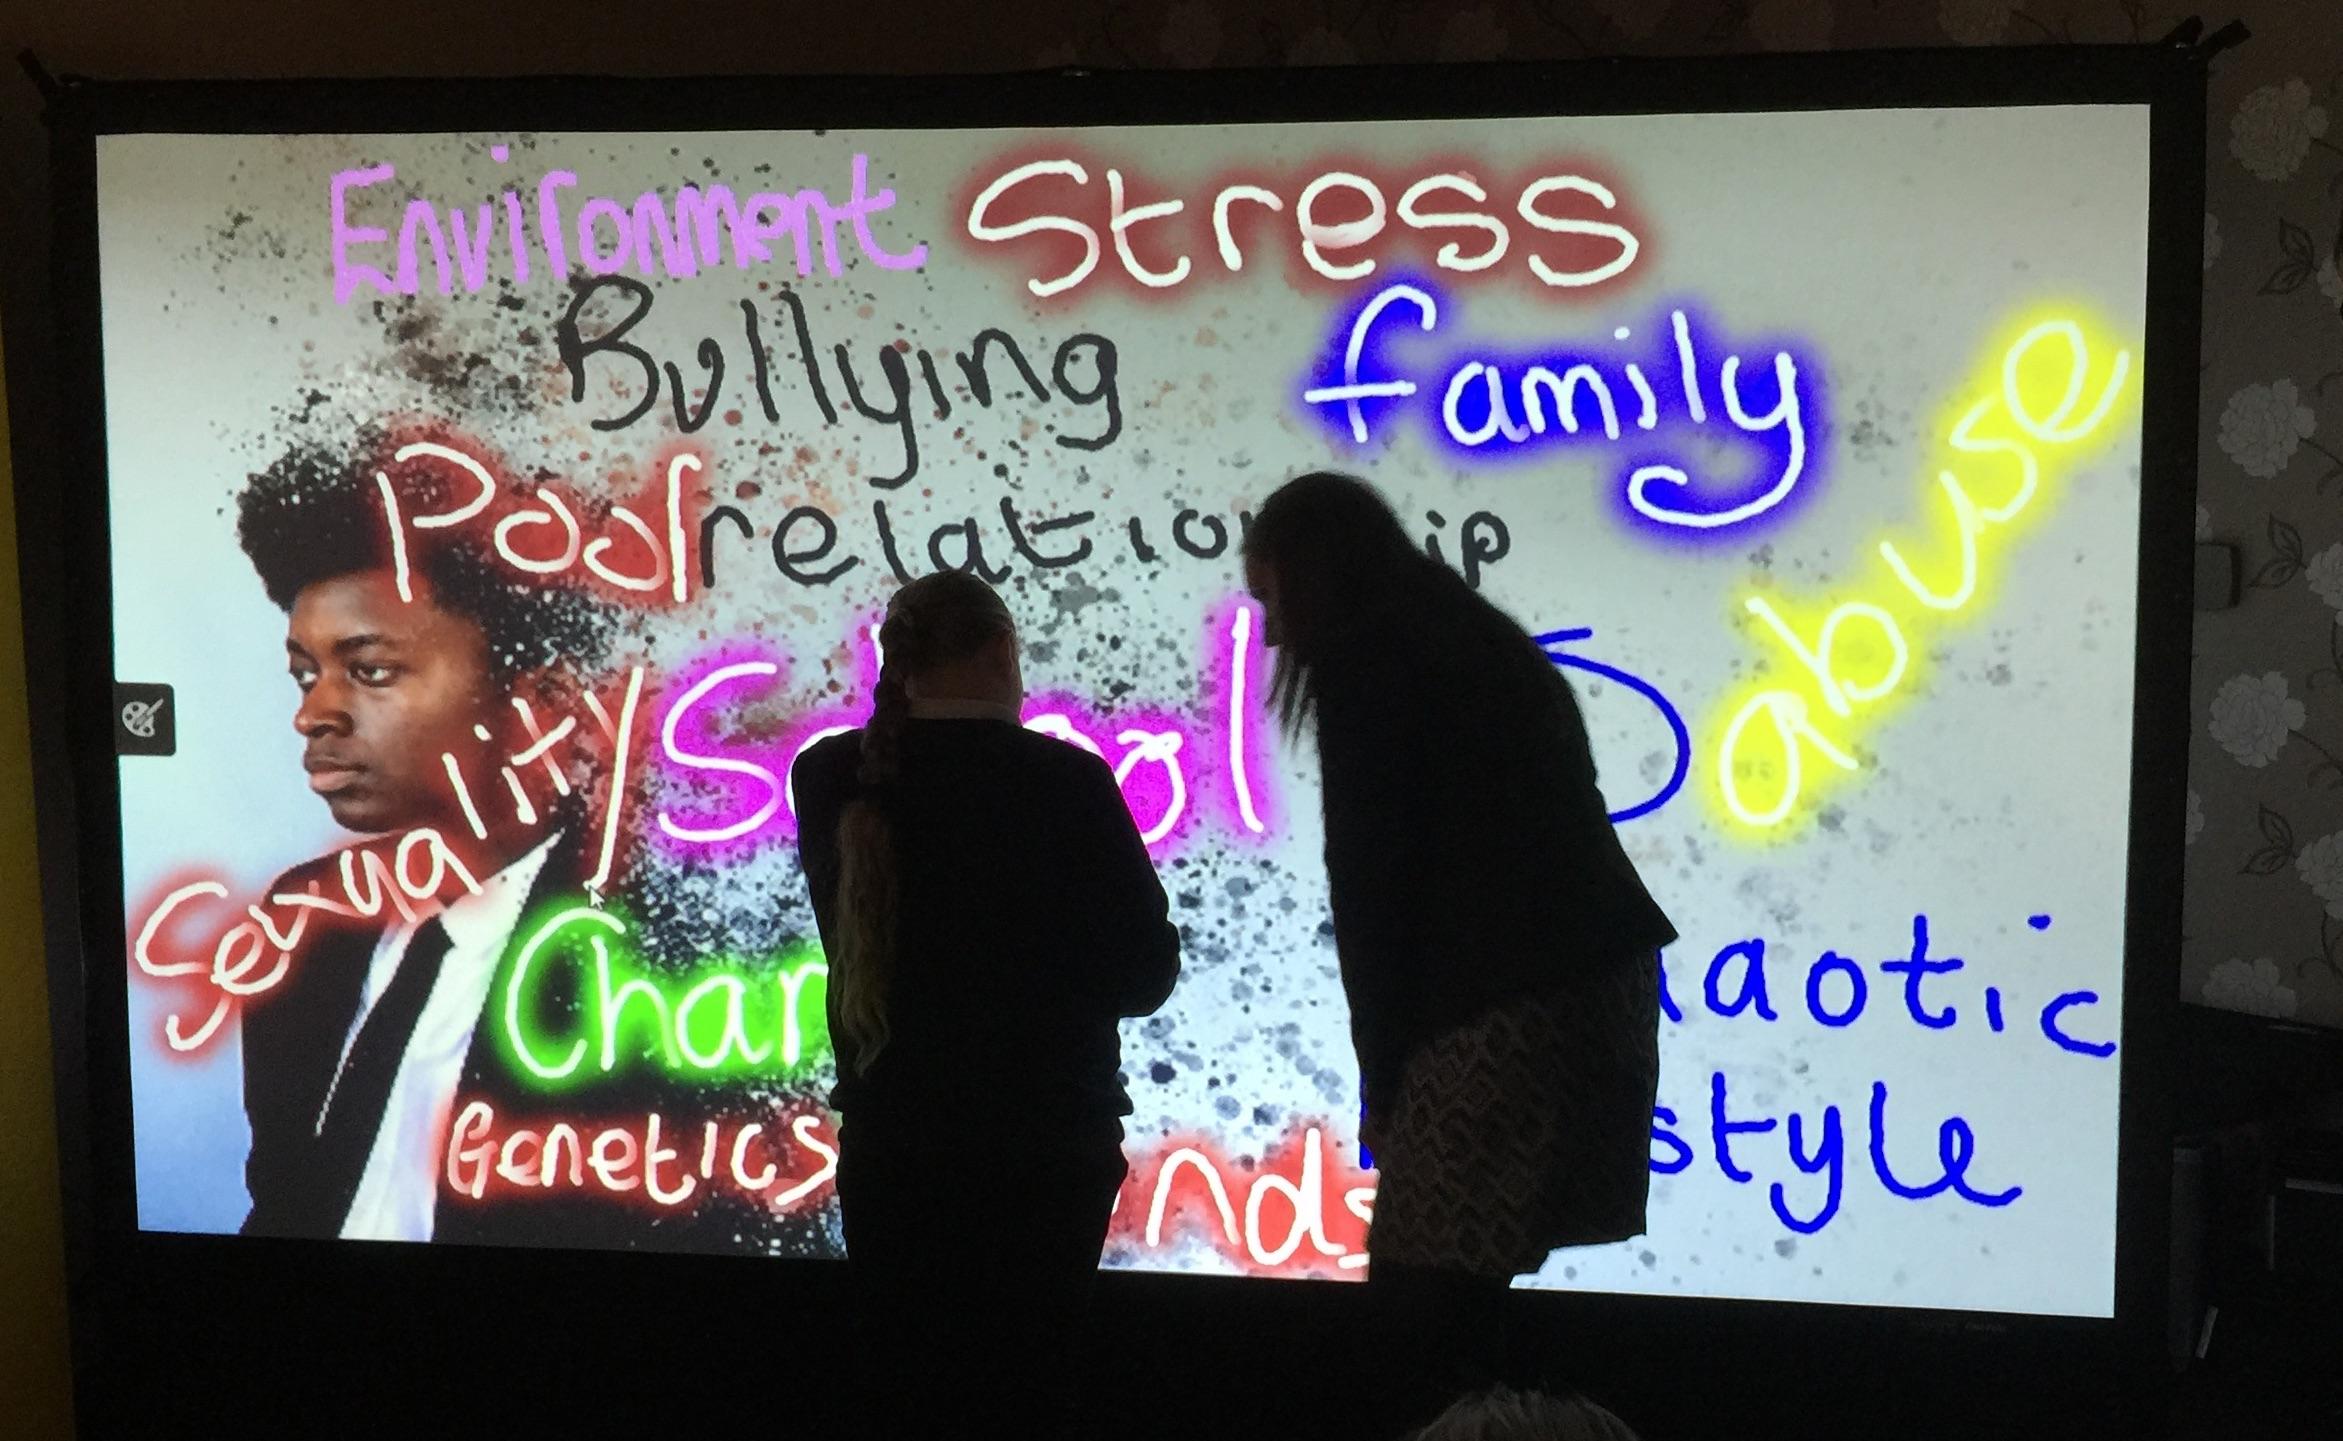 The Digital Graffiti Wall